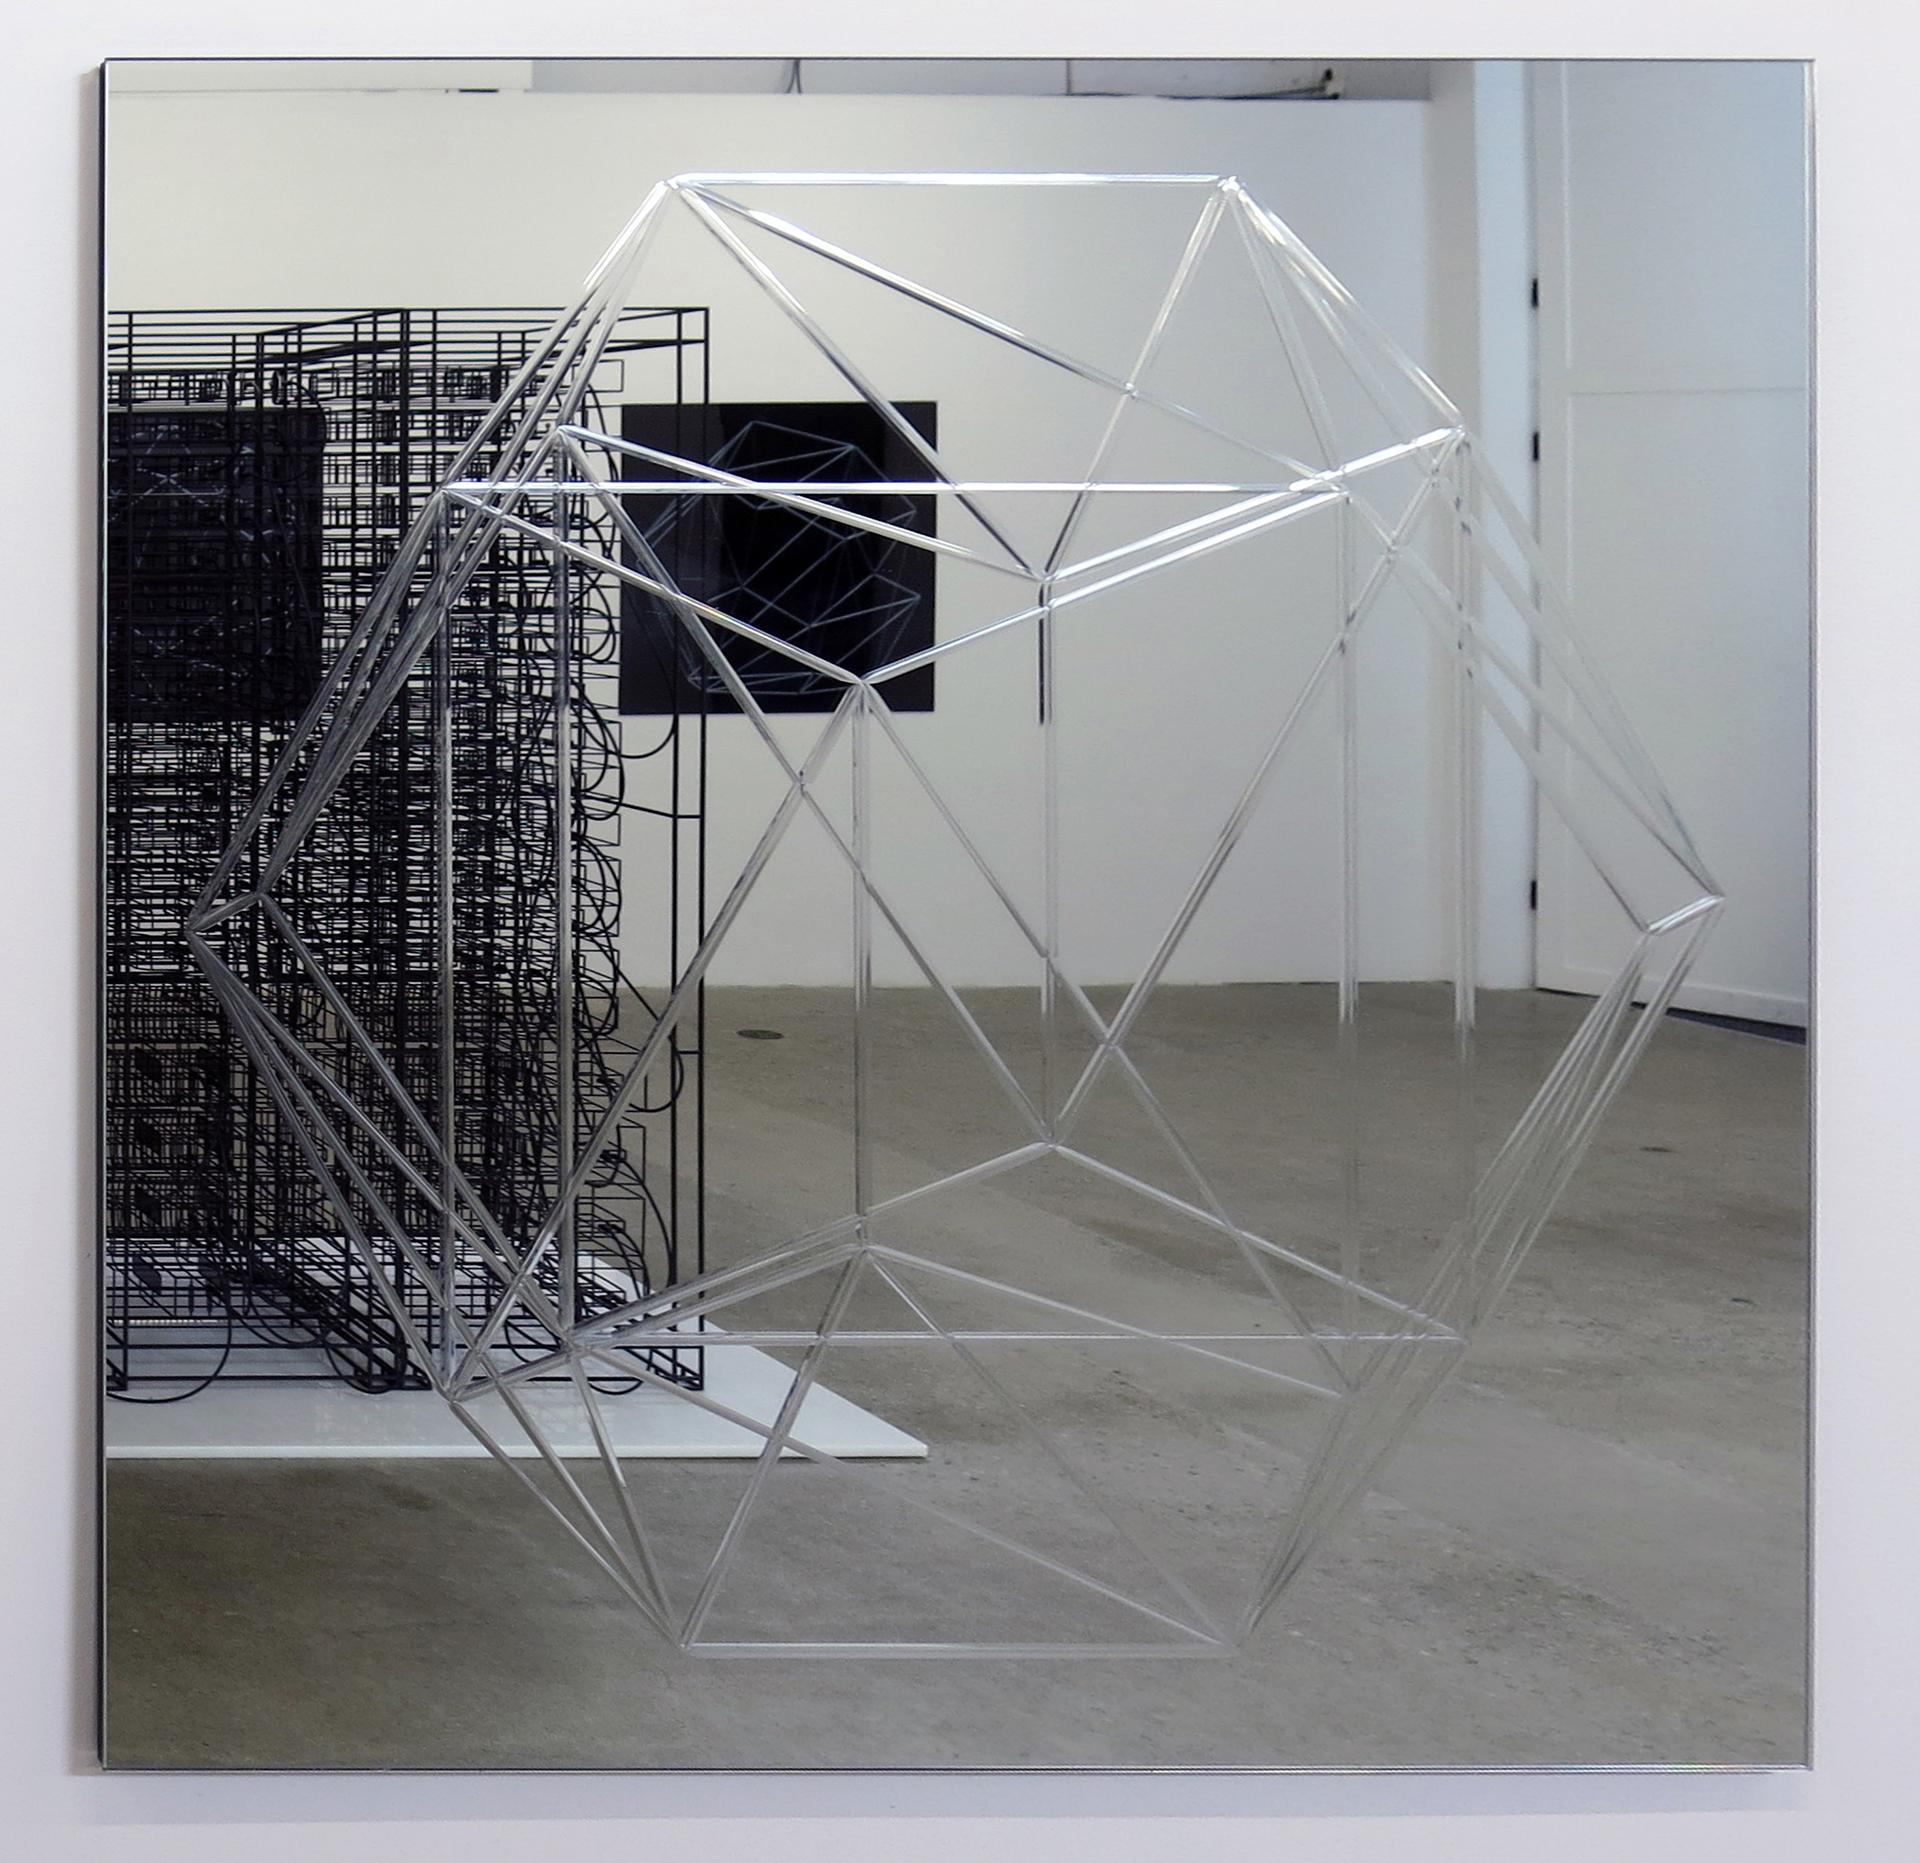 Miroir (Dodécaèdre) 03   Miroir 107 x 107 cm